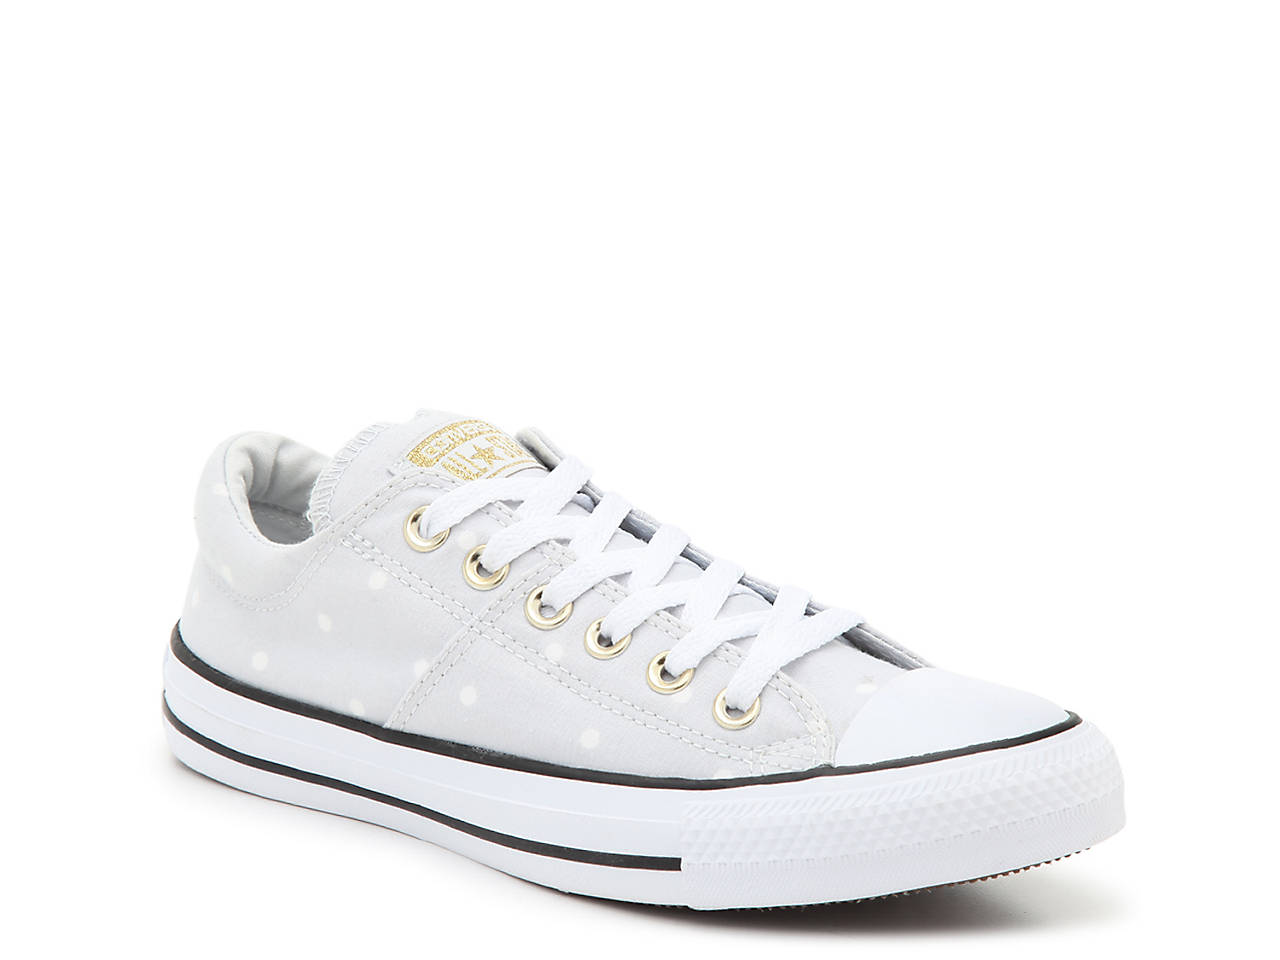 cfe9f53d4bf7 Converse Chuck Taylor All Star Madison Sneaker - Women s Women s ...